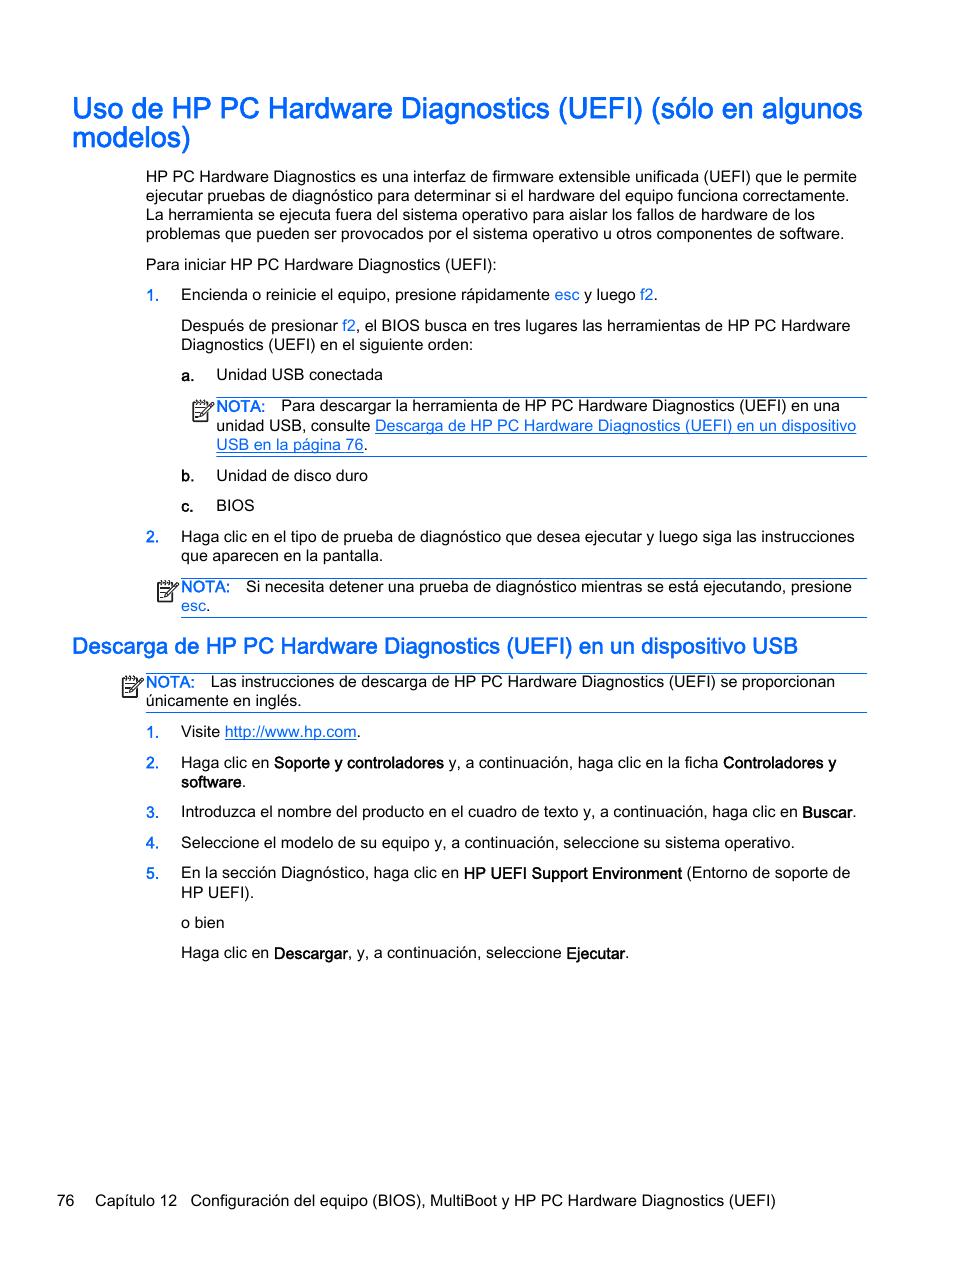 HP PC Notebook HP EliteBook Folio 1040 G1 Manual del usuario